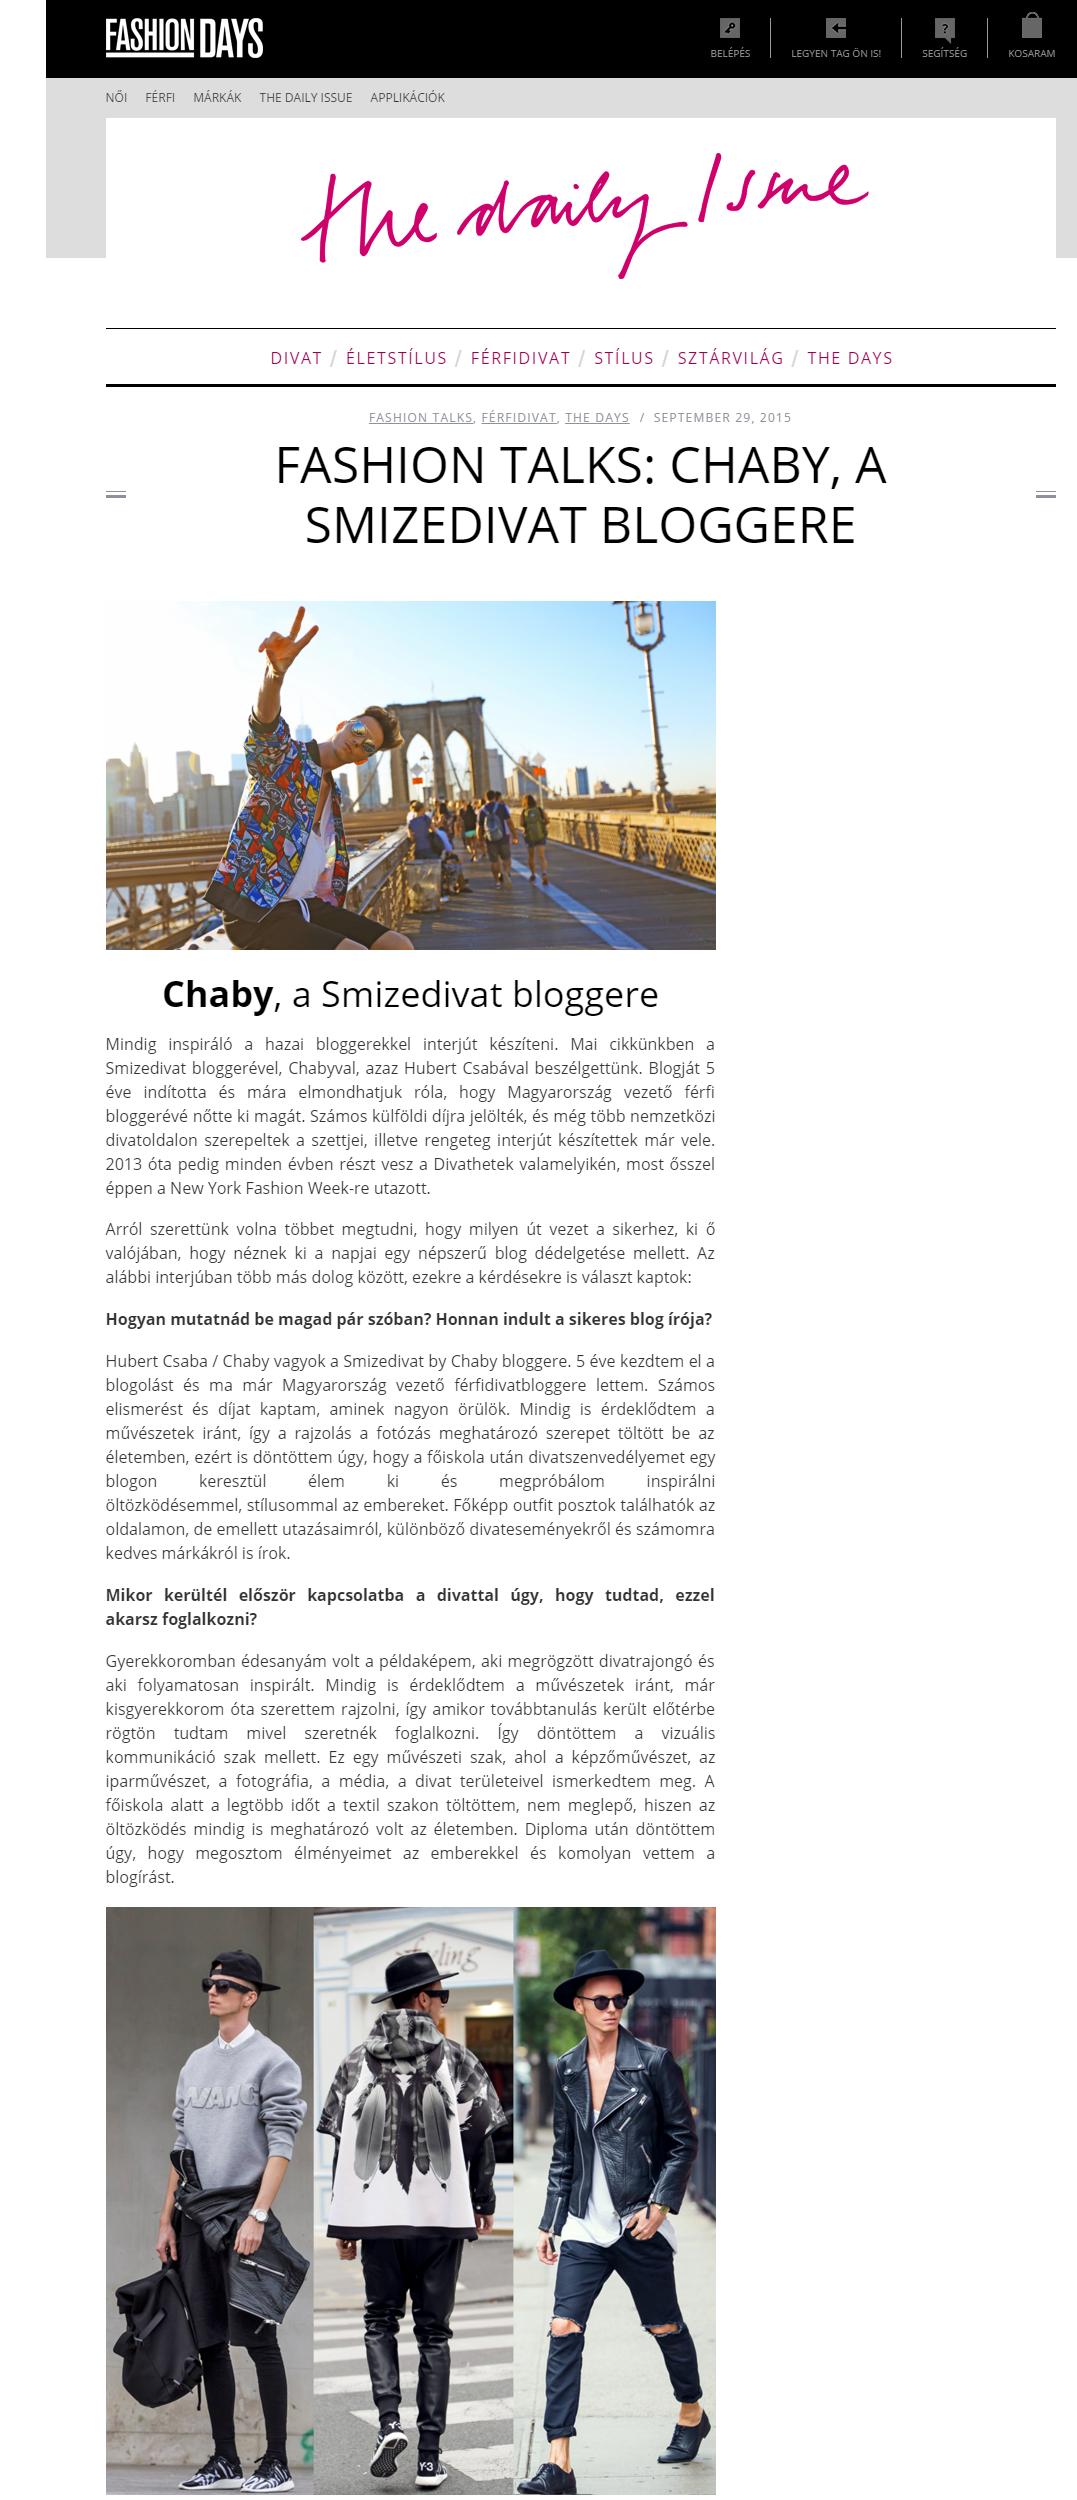 01fashion-days-interju-smizedivat-chaby-hubert-csaba-interview-fashion-blogger-divatblogger_1.png